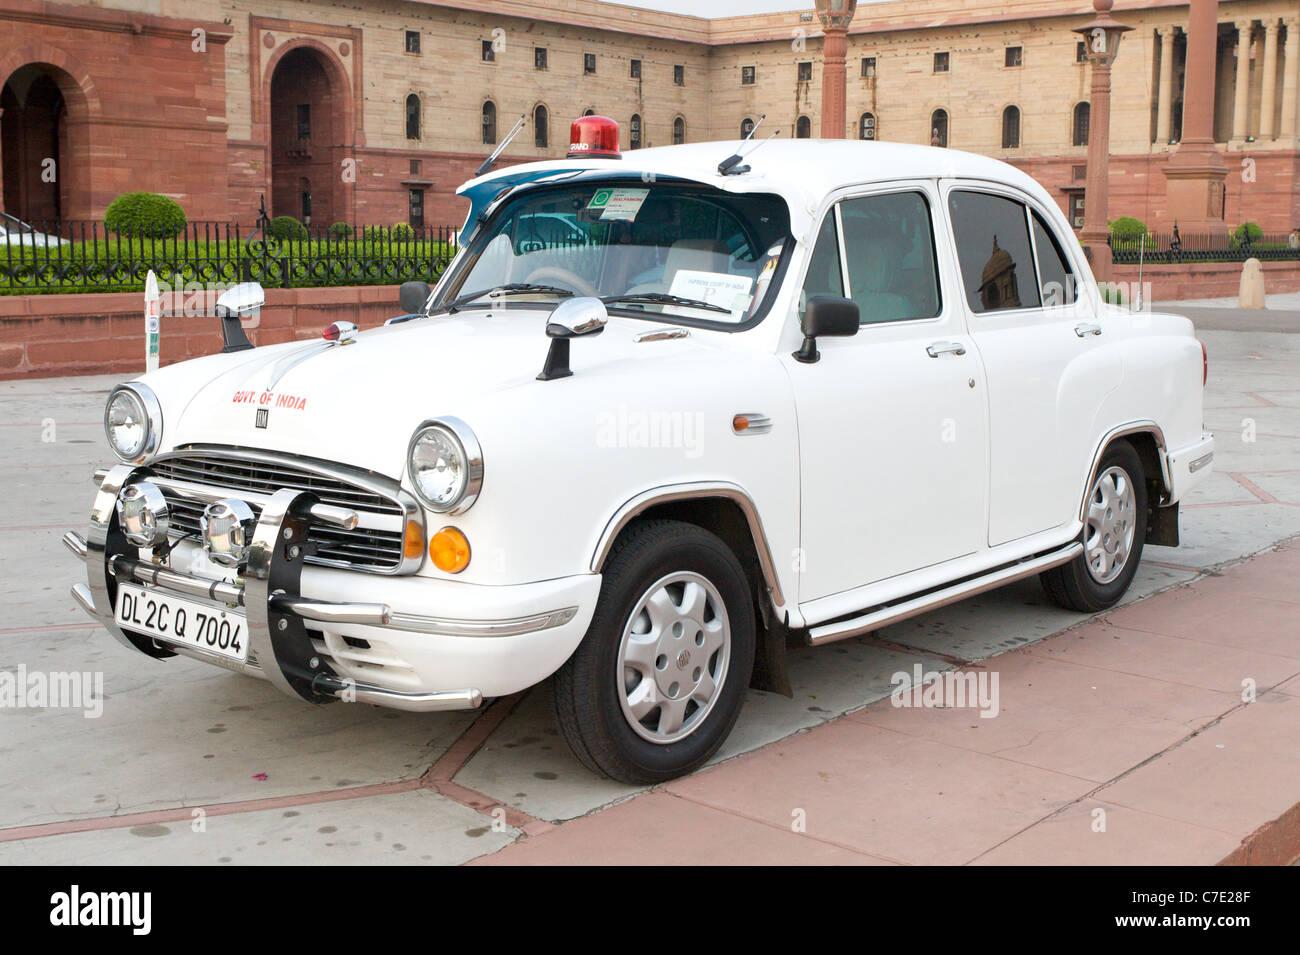 Hindustan Ambassador Stock Photos & Hindustan Ambassador Stock ...